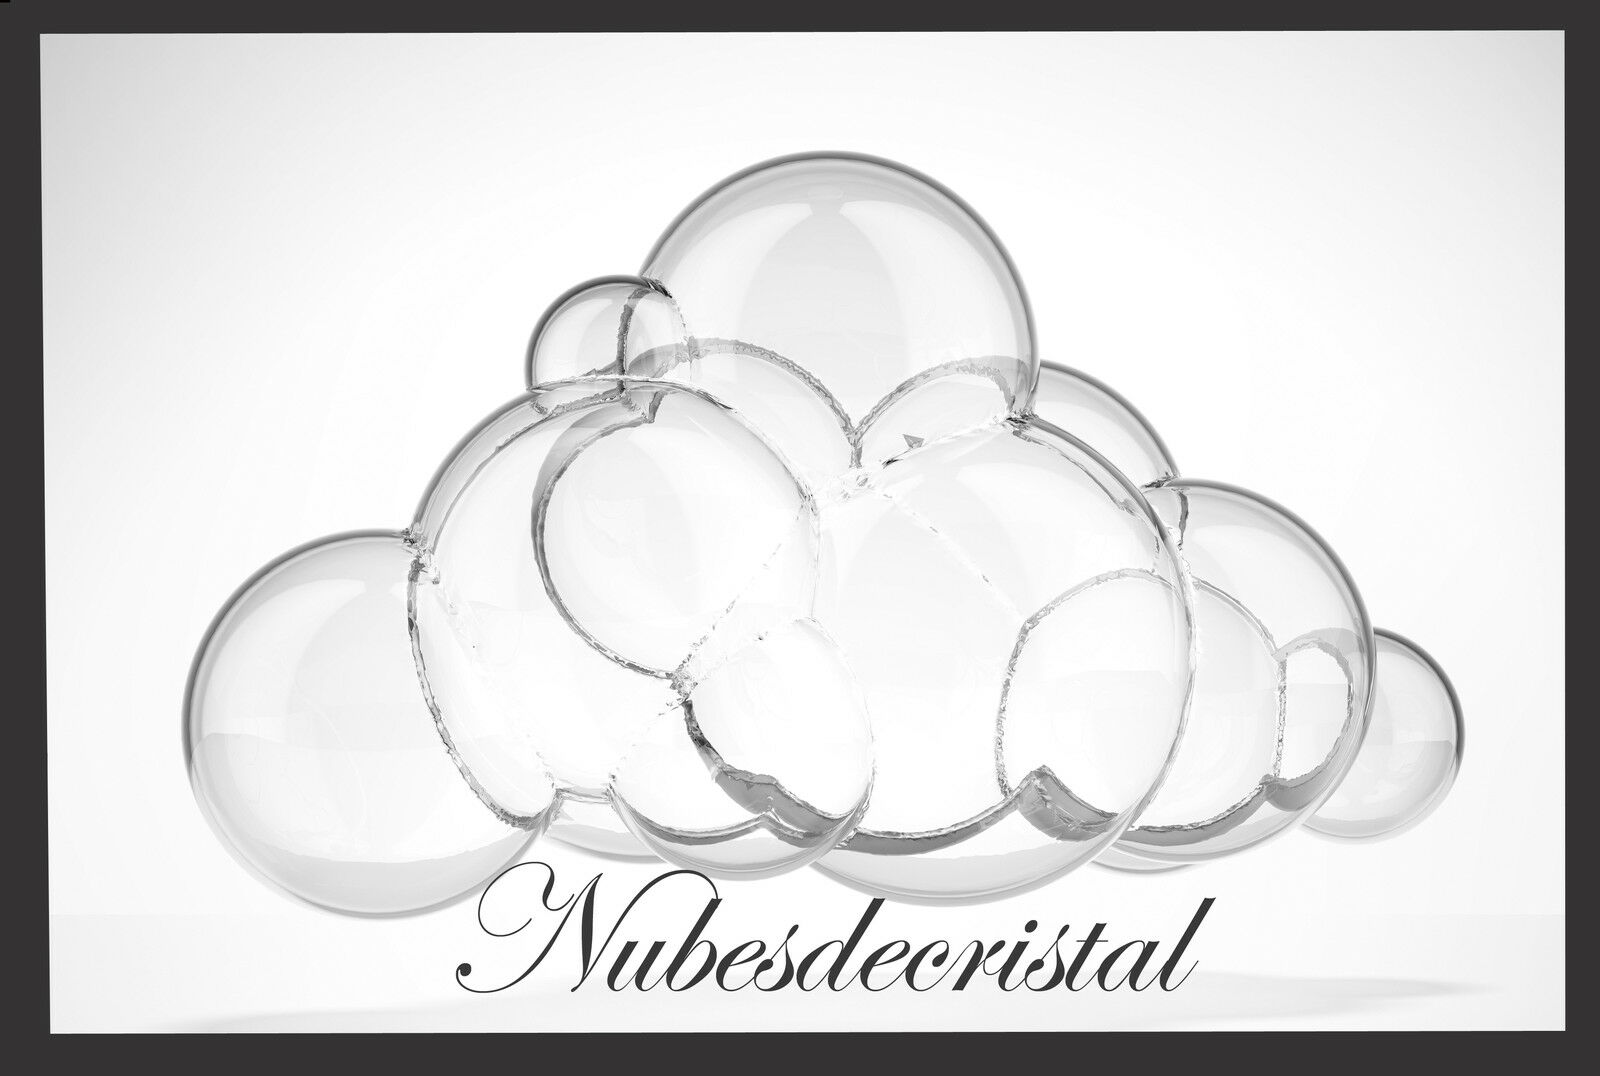 Nubesdecristal